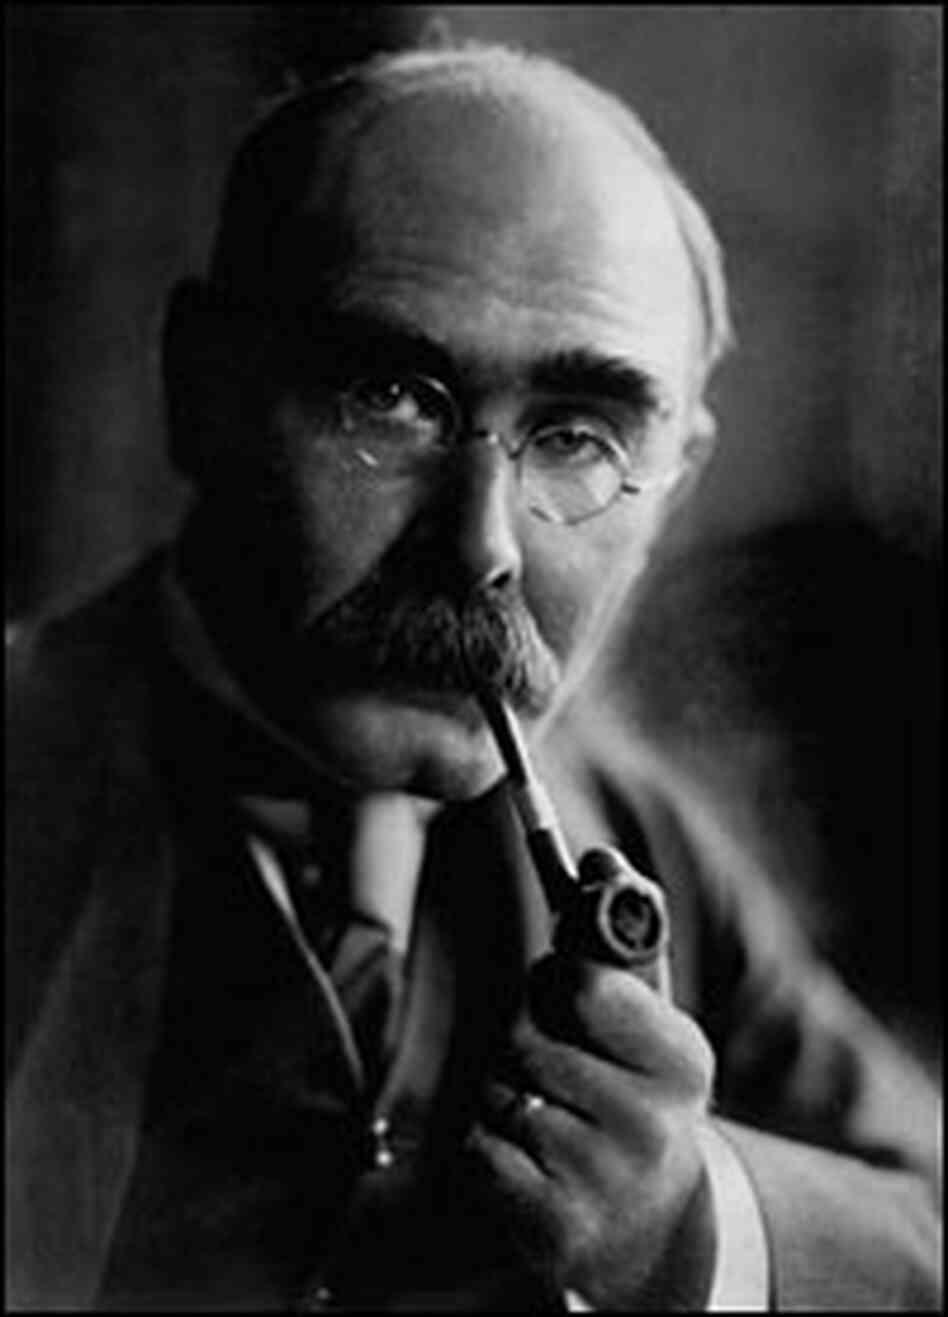 Rudyard Kipling historical significance